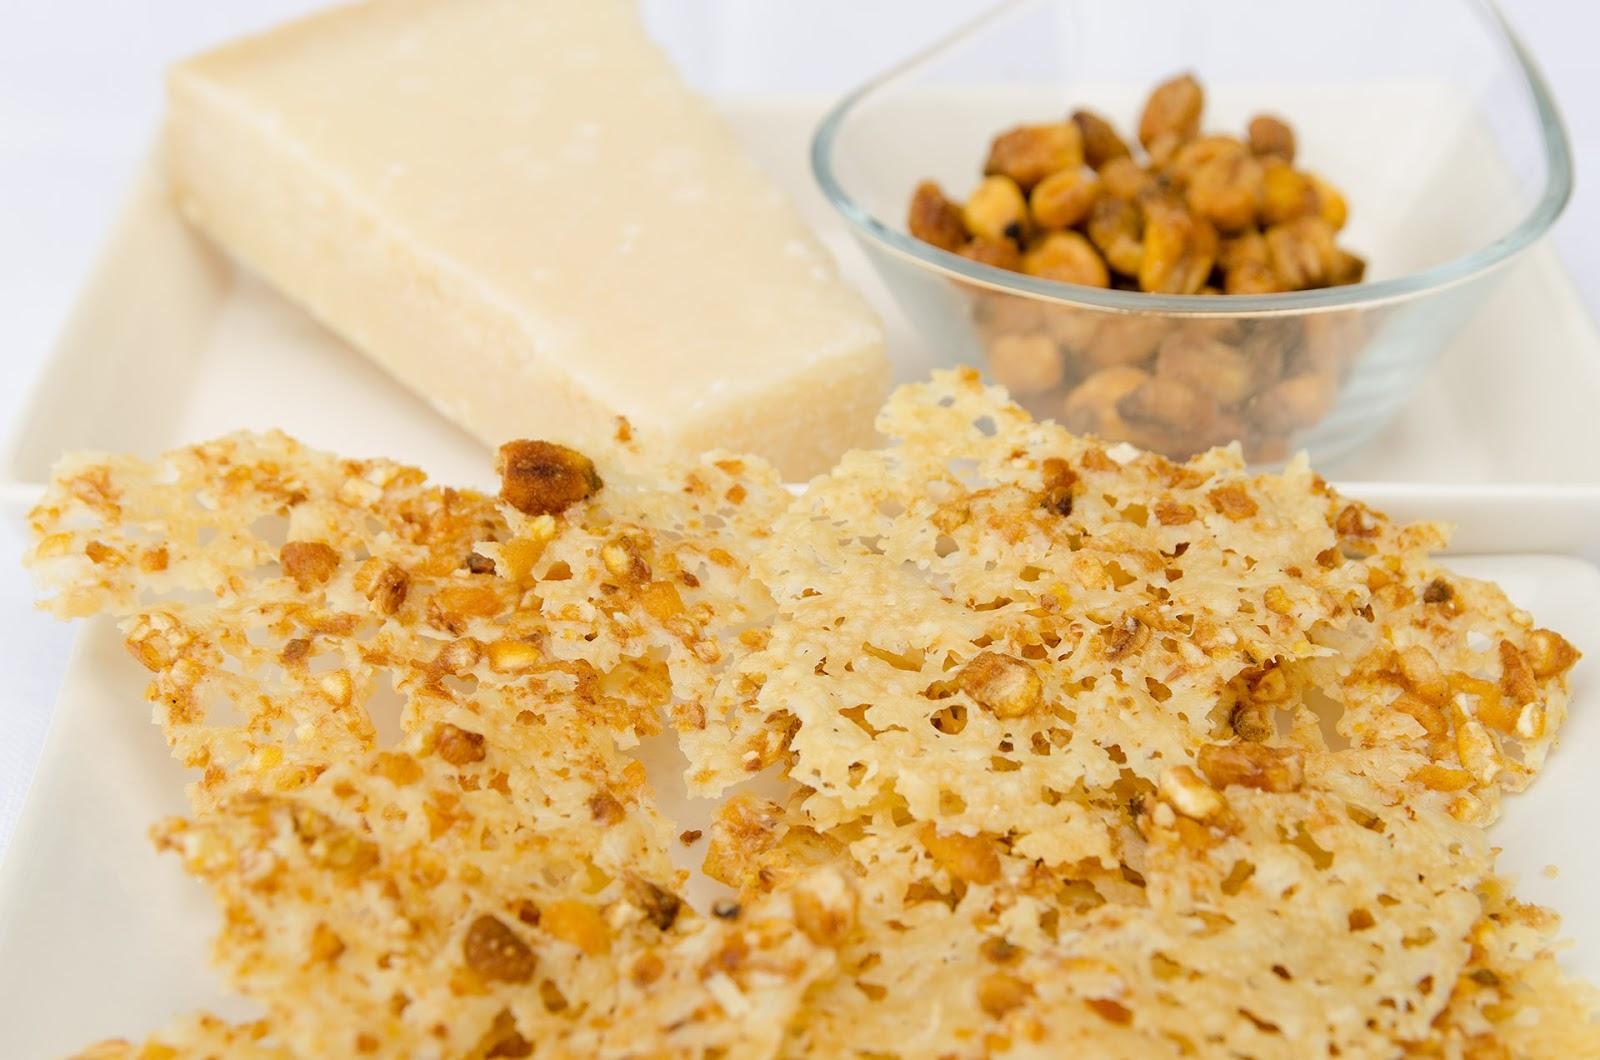 aperitivo-pica-pica-tapas-chips-receta-queso-cocina-faciles-parmesano-gruyere-quicos-kikos-bruja